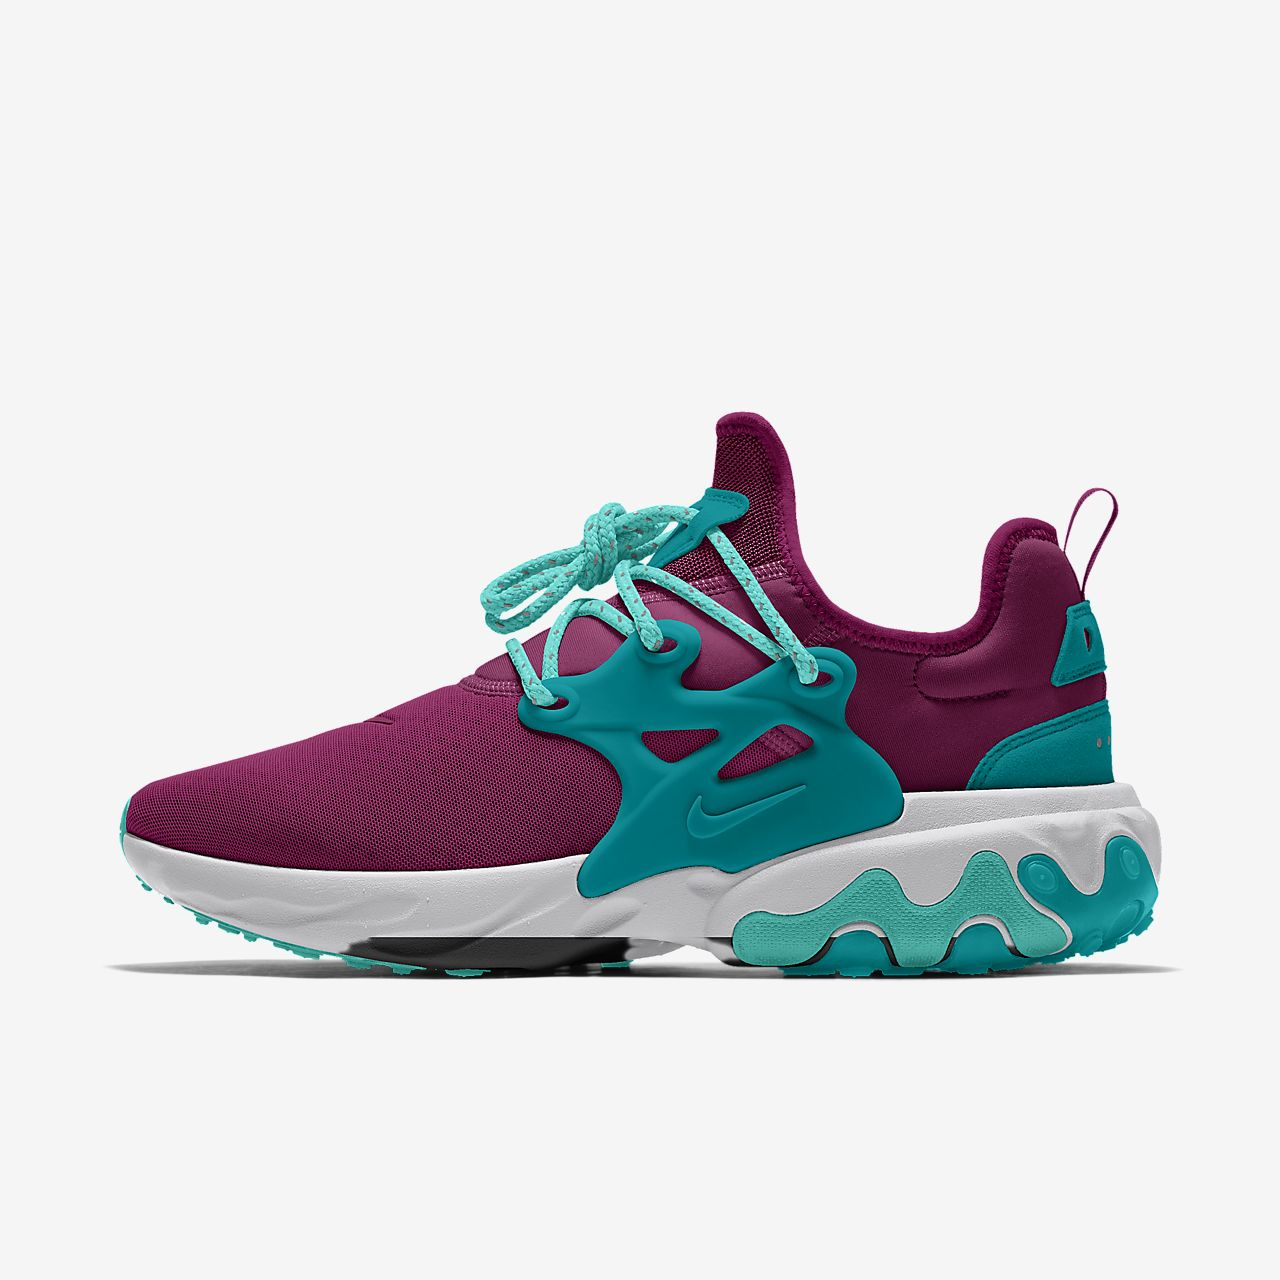 Calzado para mujer personalizado Nike React Presto By You